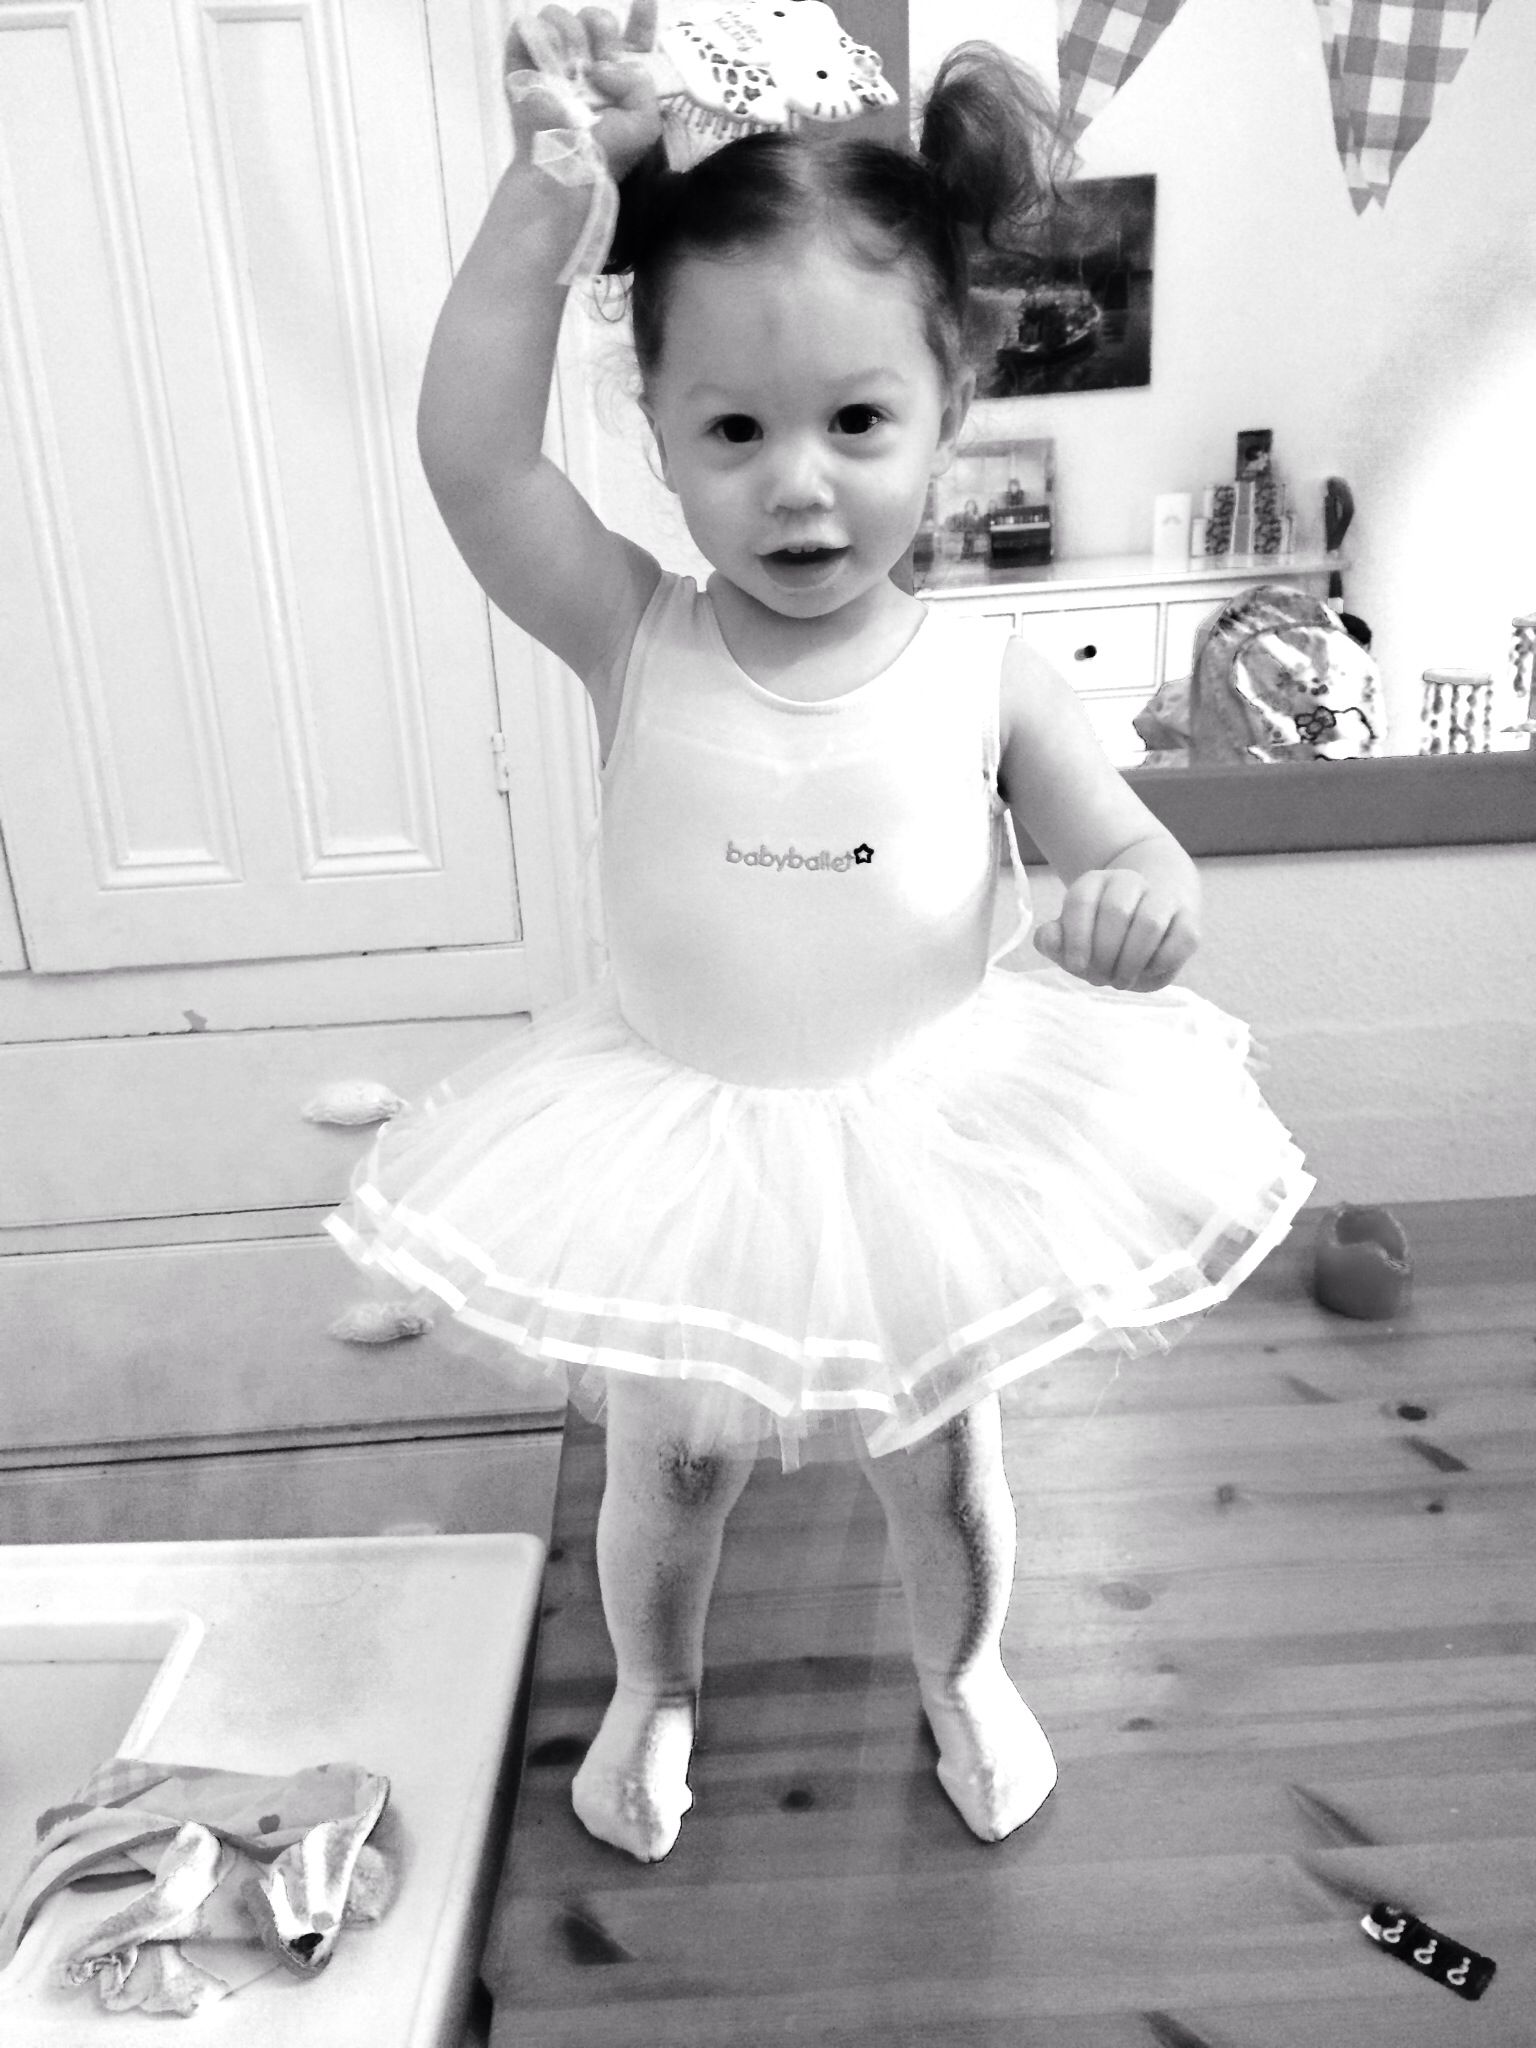 82b0a3ec8 Baby ballet